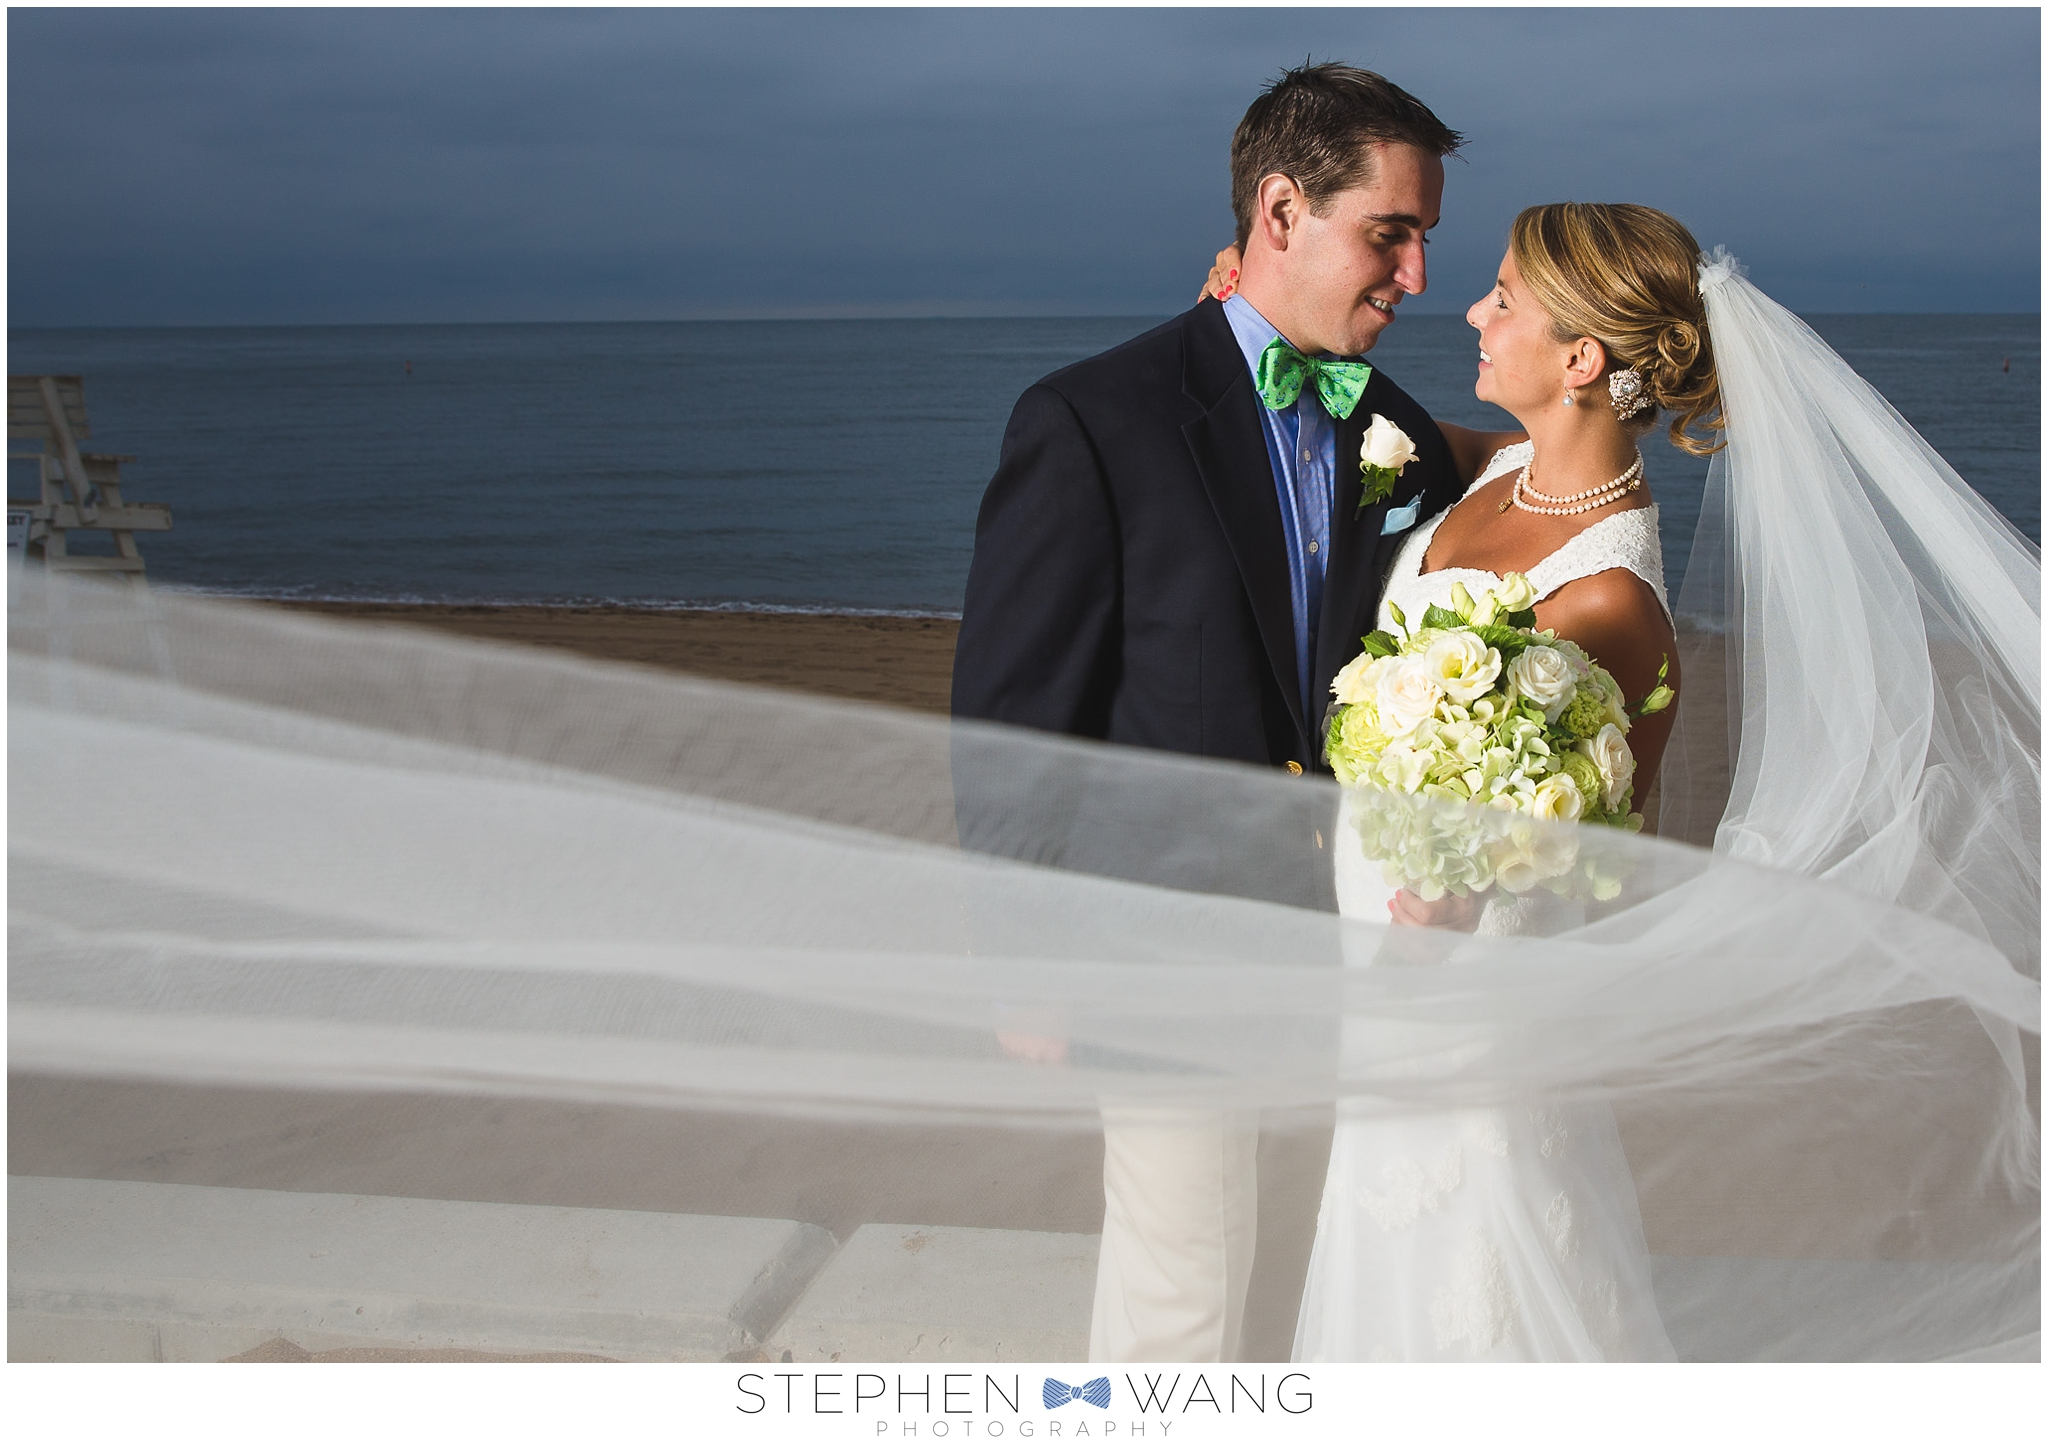 Stephen Wang Photography Madison Surf Club Wedding Photogrpahy CT Connecticut Shoreline Beach Summer Sunset -08-12_0031.jpg